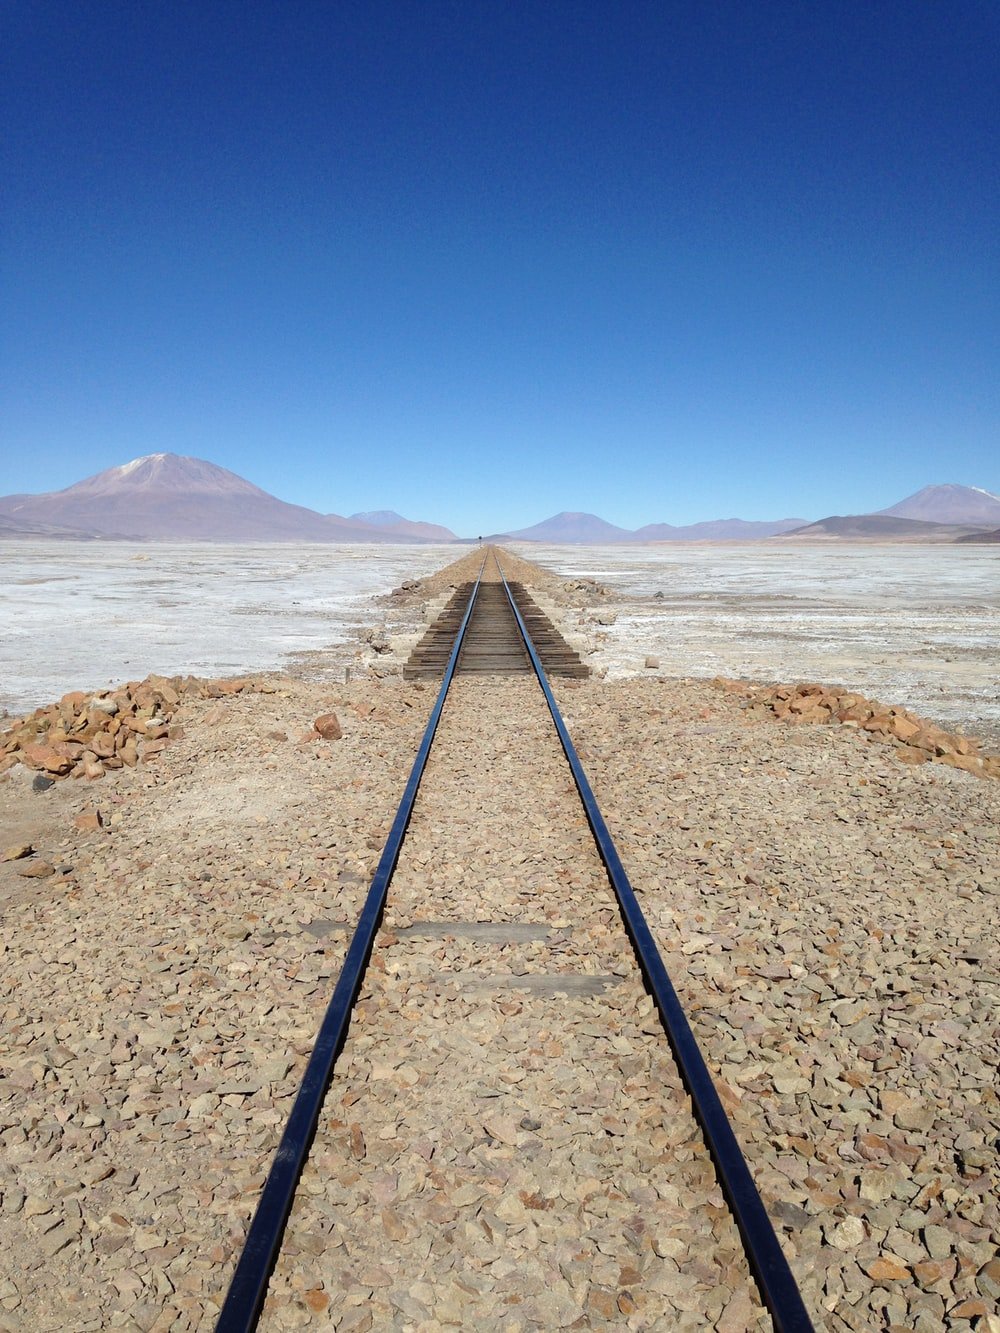 black metal train rail on brown rocky shore during daytime